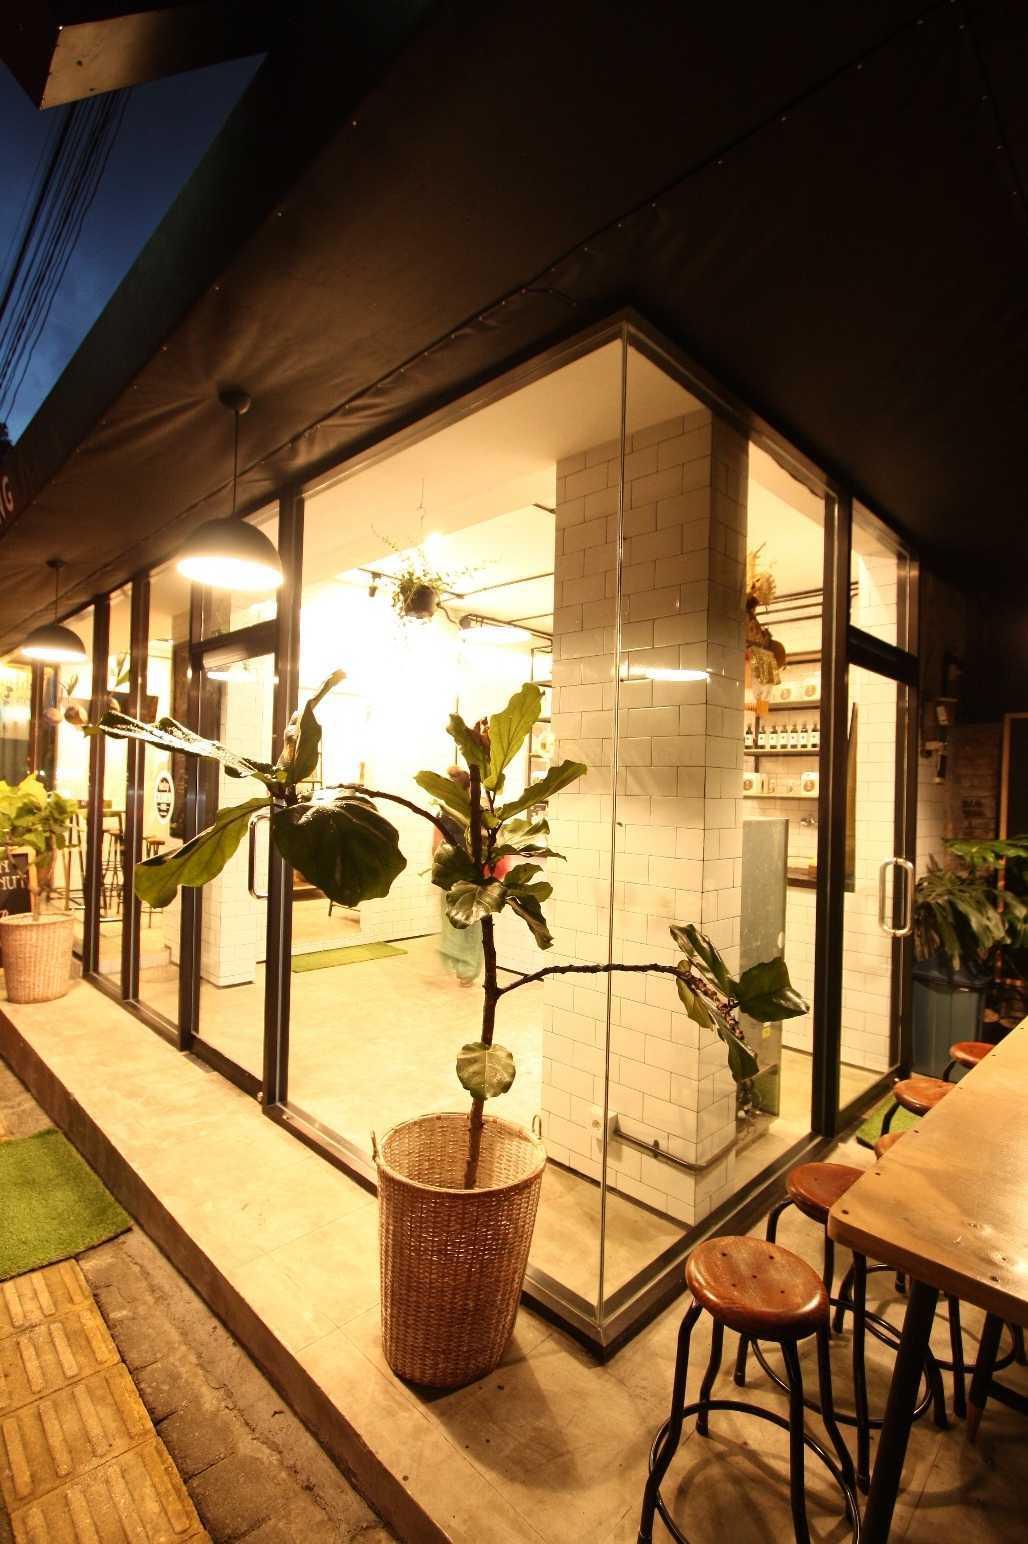 Ddap Architect Coconut Warung Shop & Cafe Ubud, Kabupaten Gianyar, Bali, Indonesia Bali Img0845 Industrial  28555